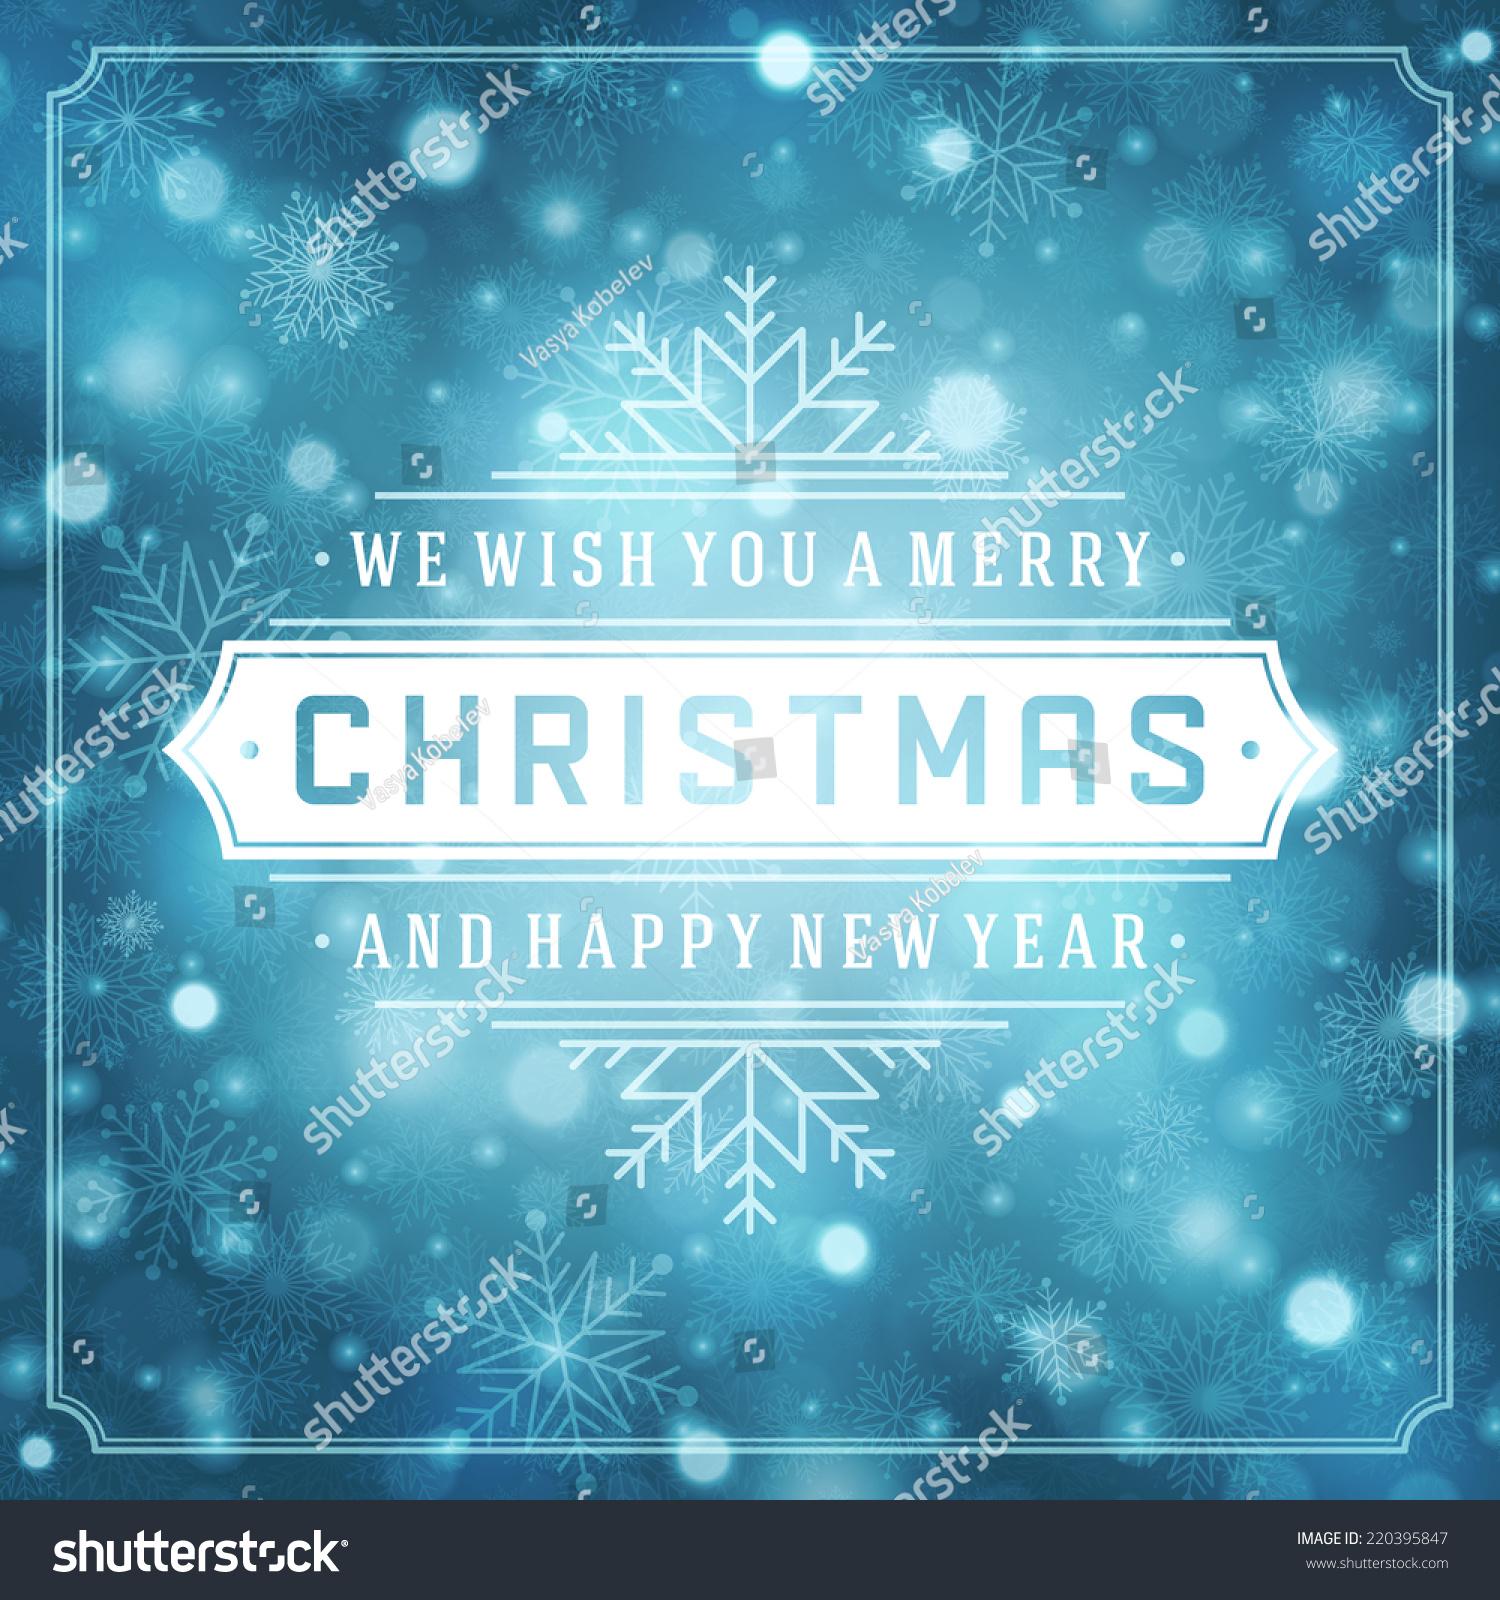 Christmas Retro Typography Light Snowflakes Merry Stock Vector 2018